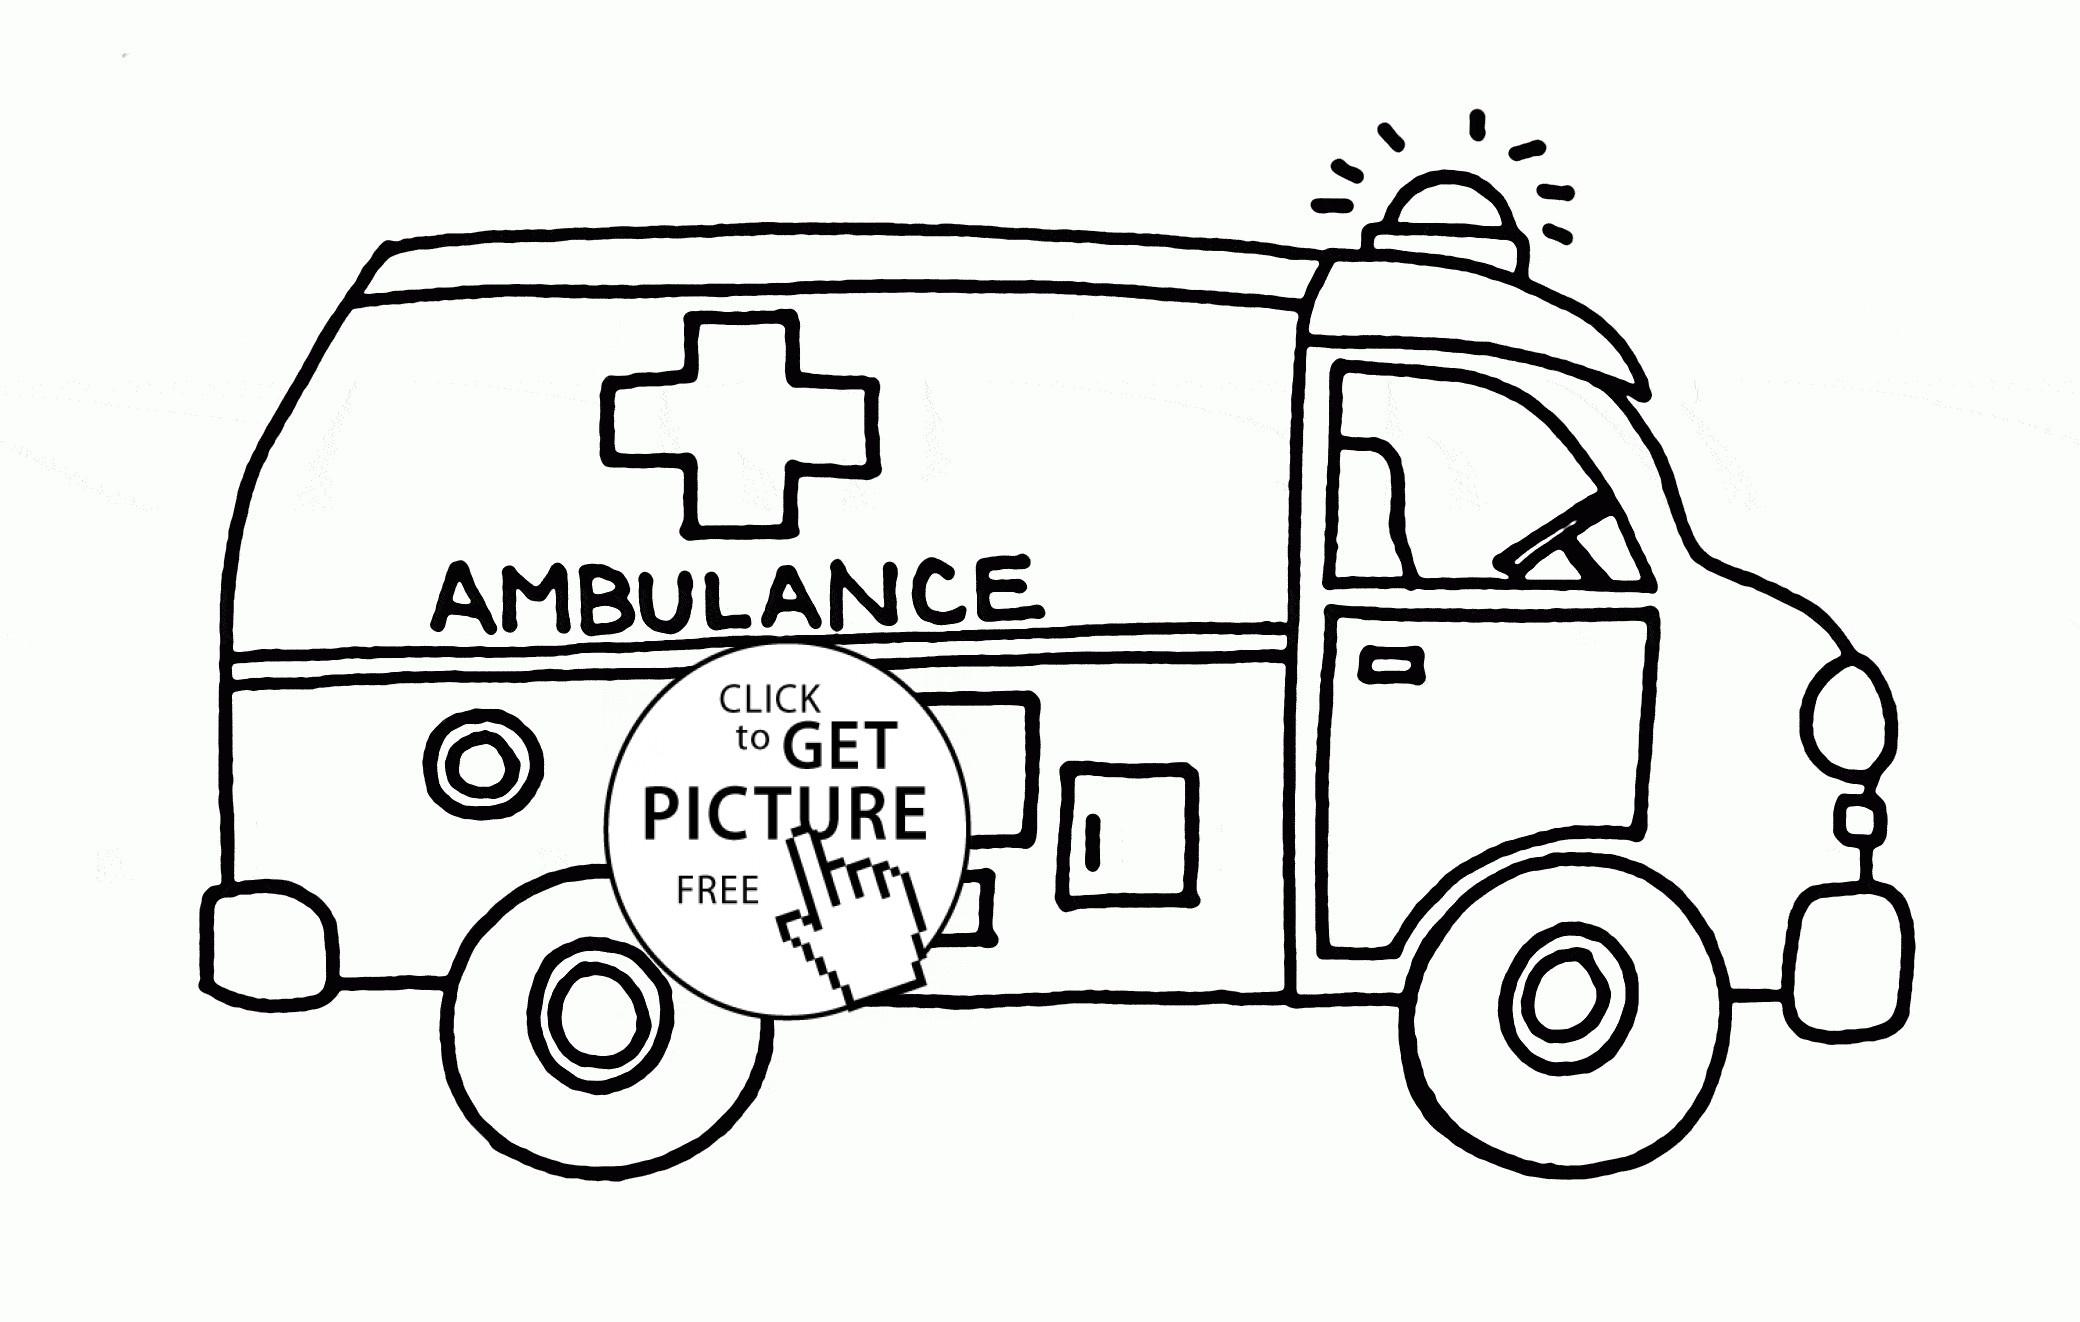 2080x1322 Elegant Lego Ambulance Car Coloring Page For Kids Lovely Ambulance